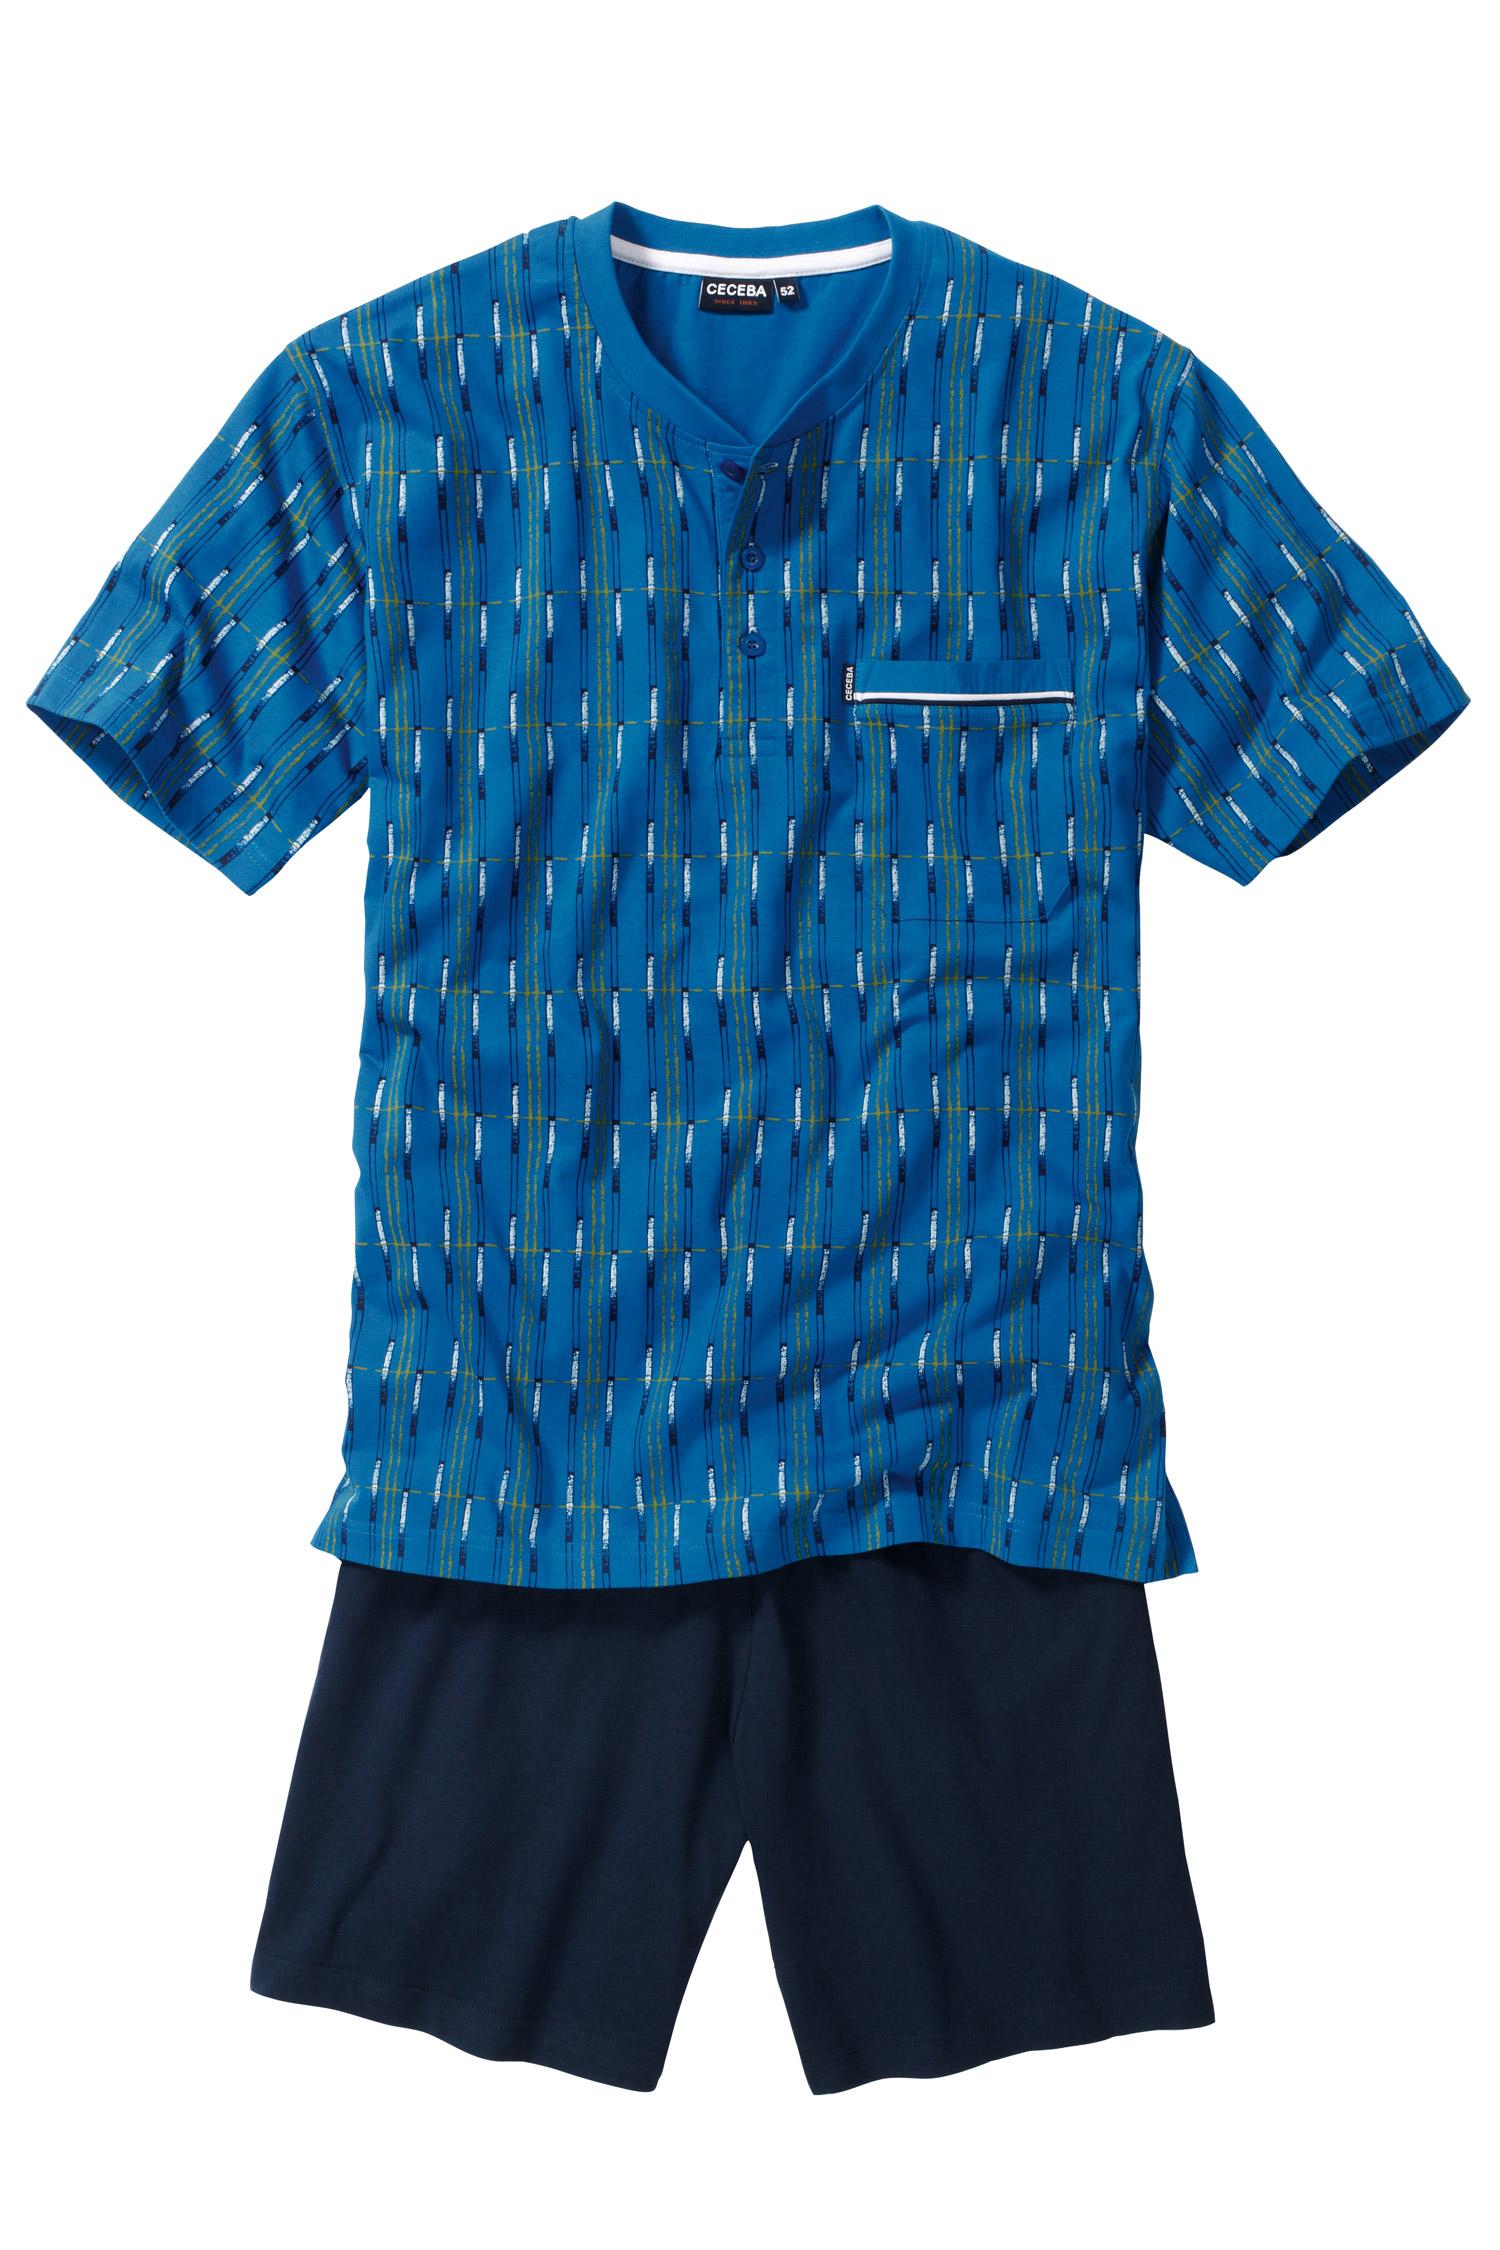 Homewear, Pijama M. Corta, 107114, ROYAL | Zoom